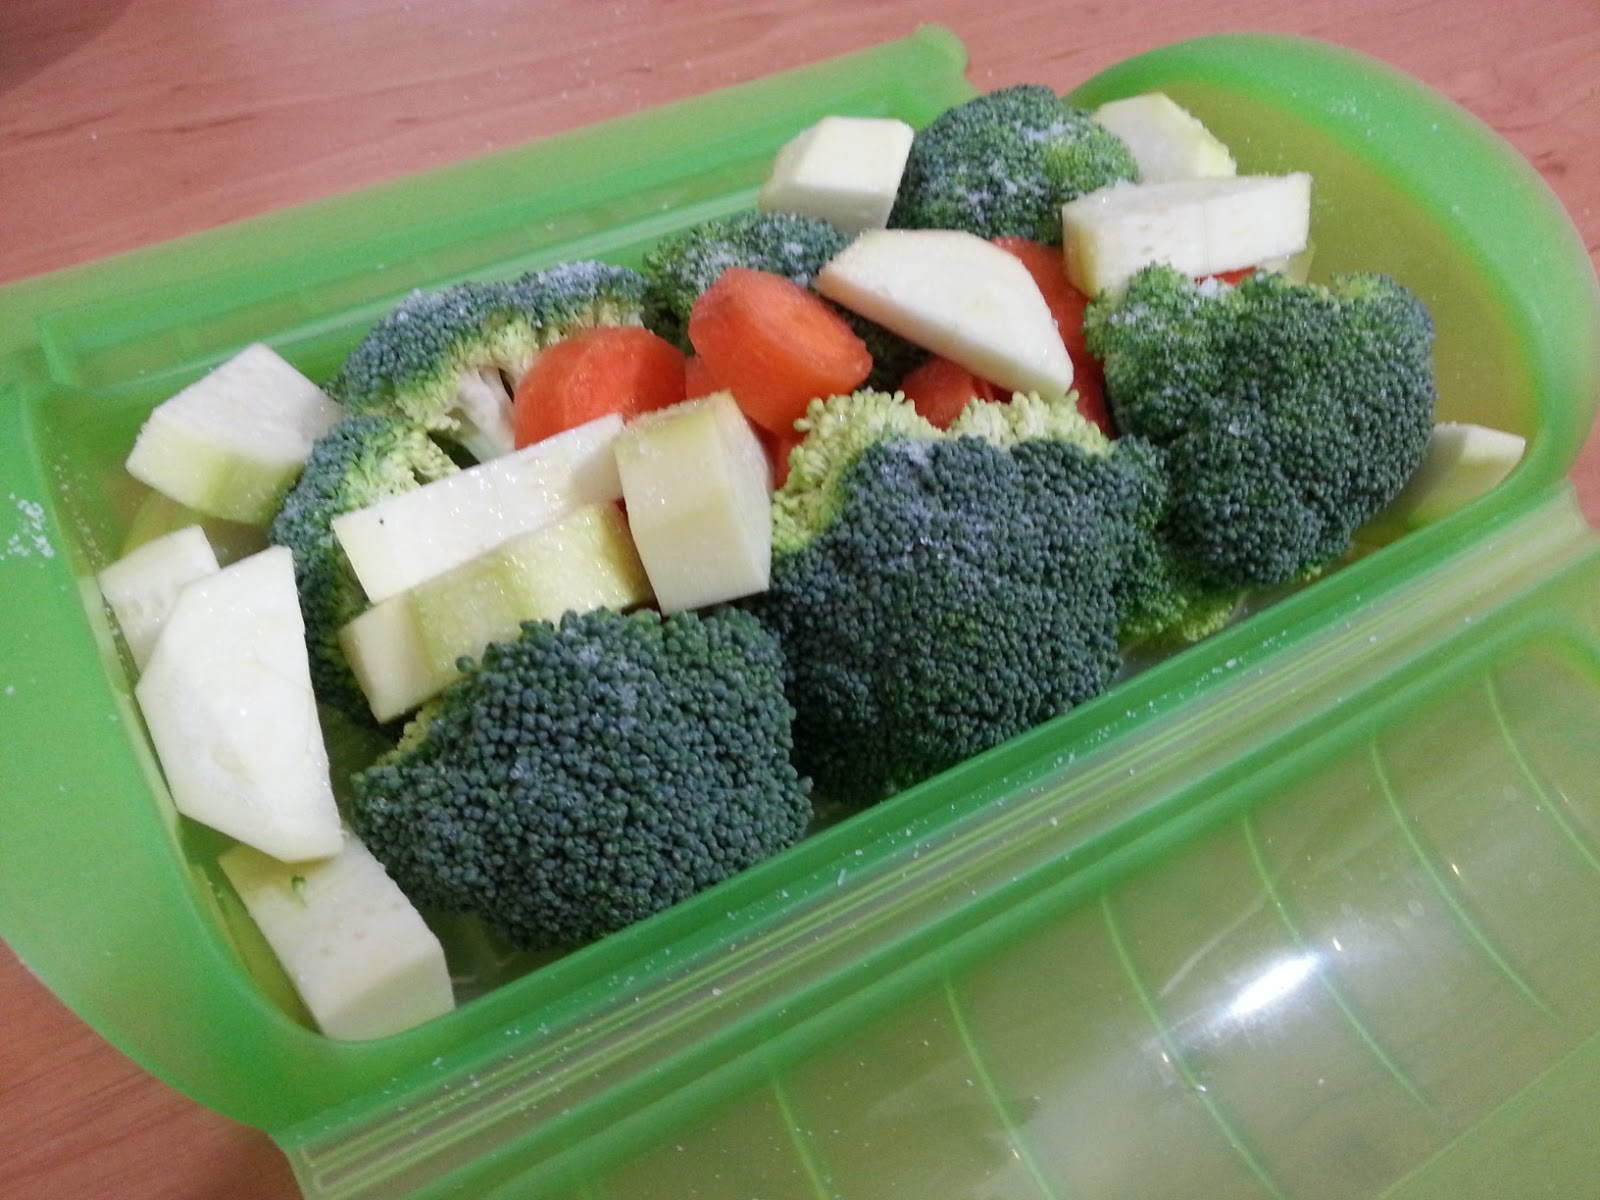 Pechuga ala plancha con verduras al vapor